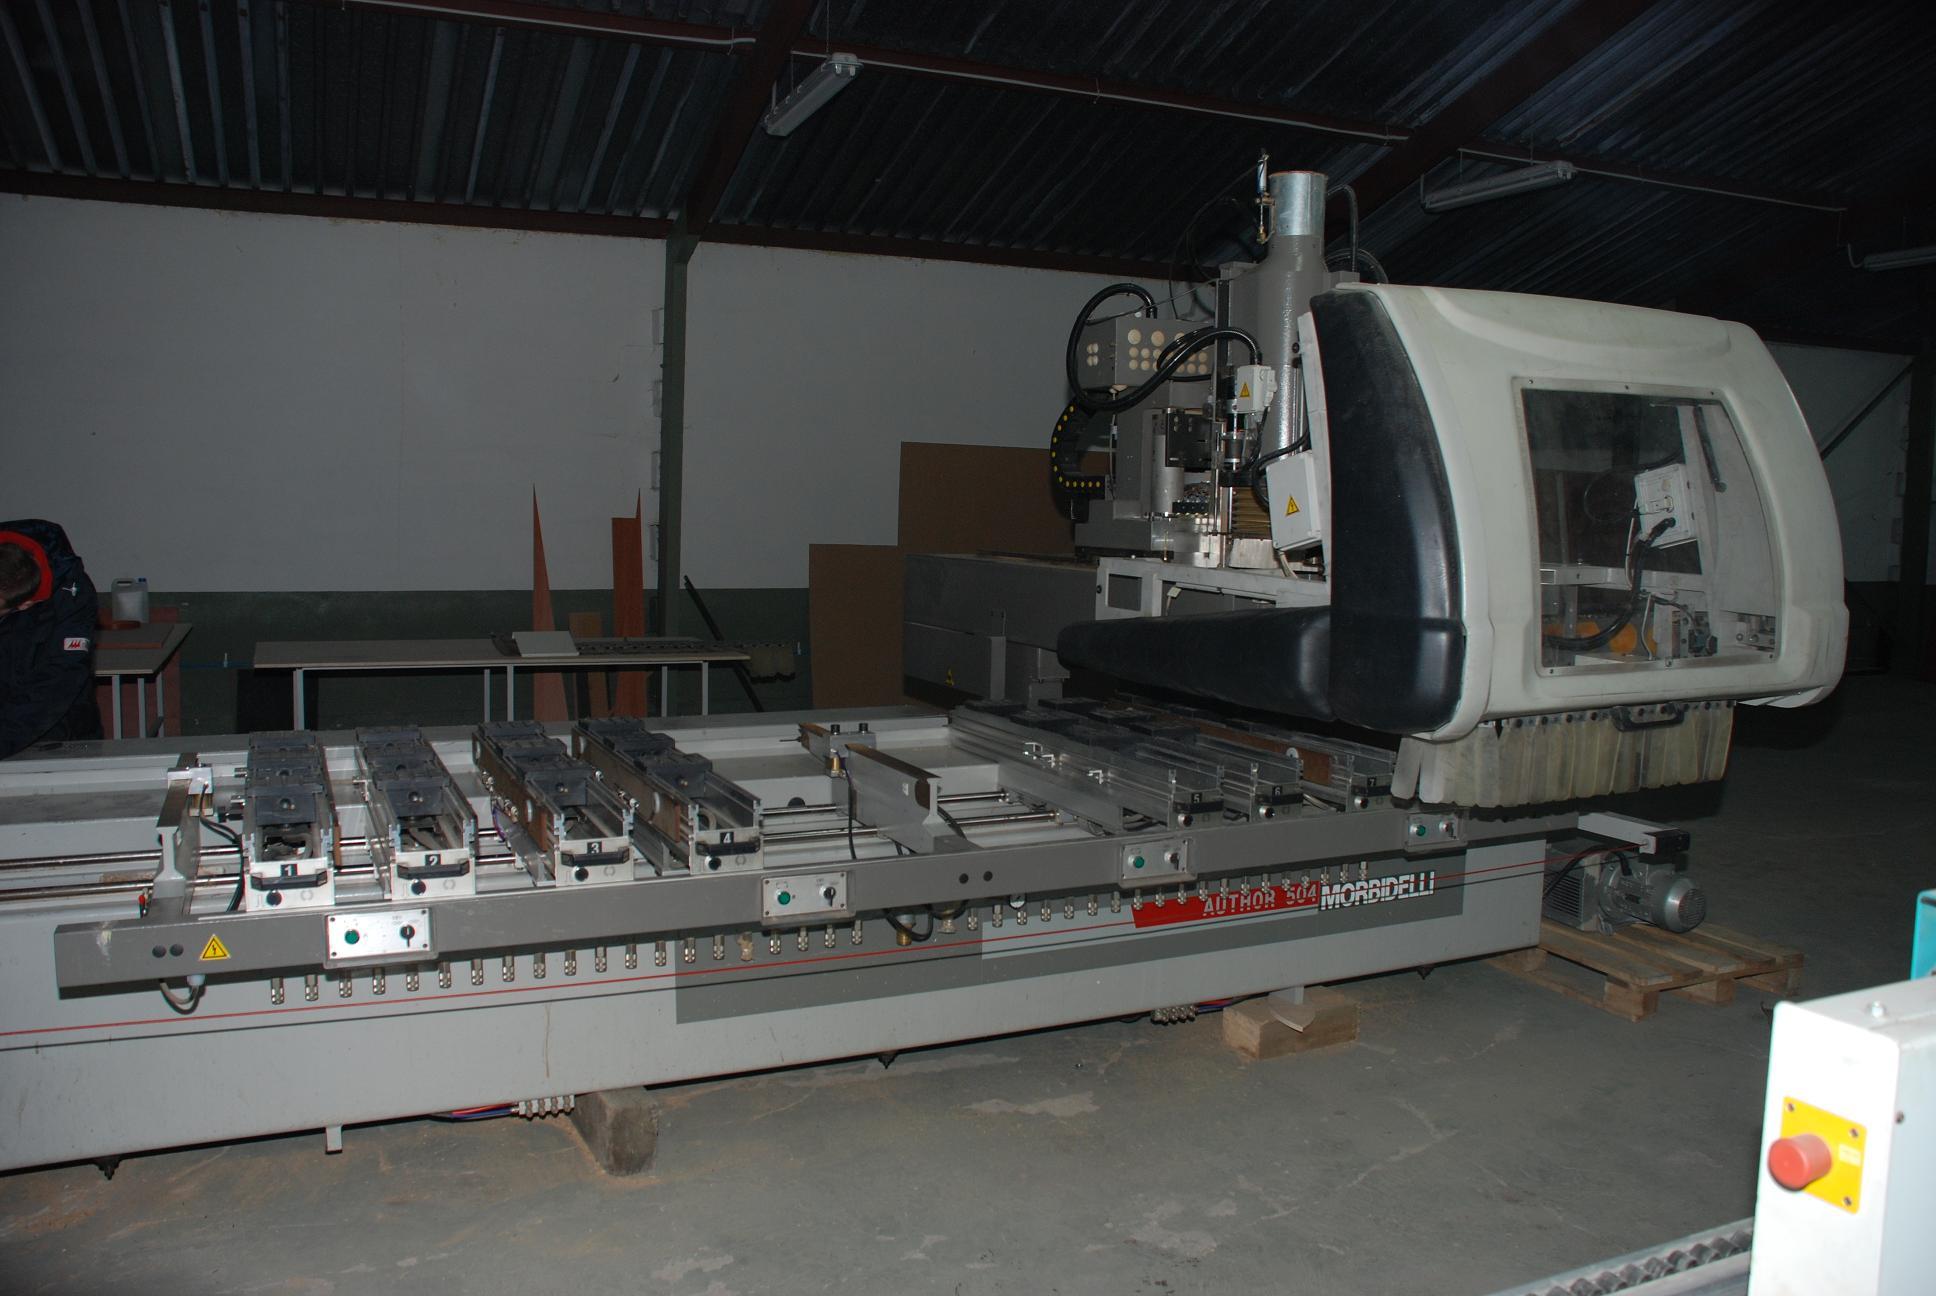 MASZYNY CNC- Morbidell AUTHOR 504